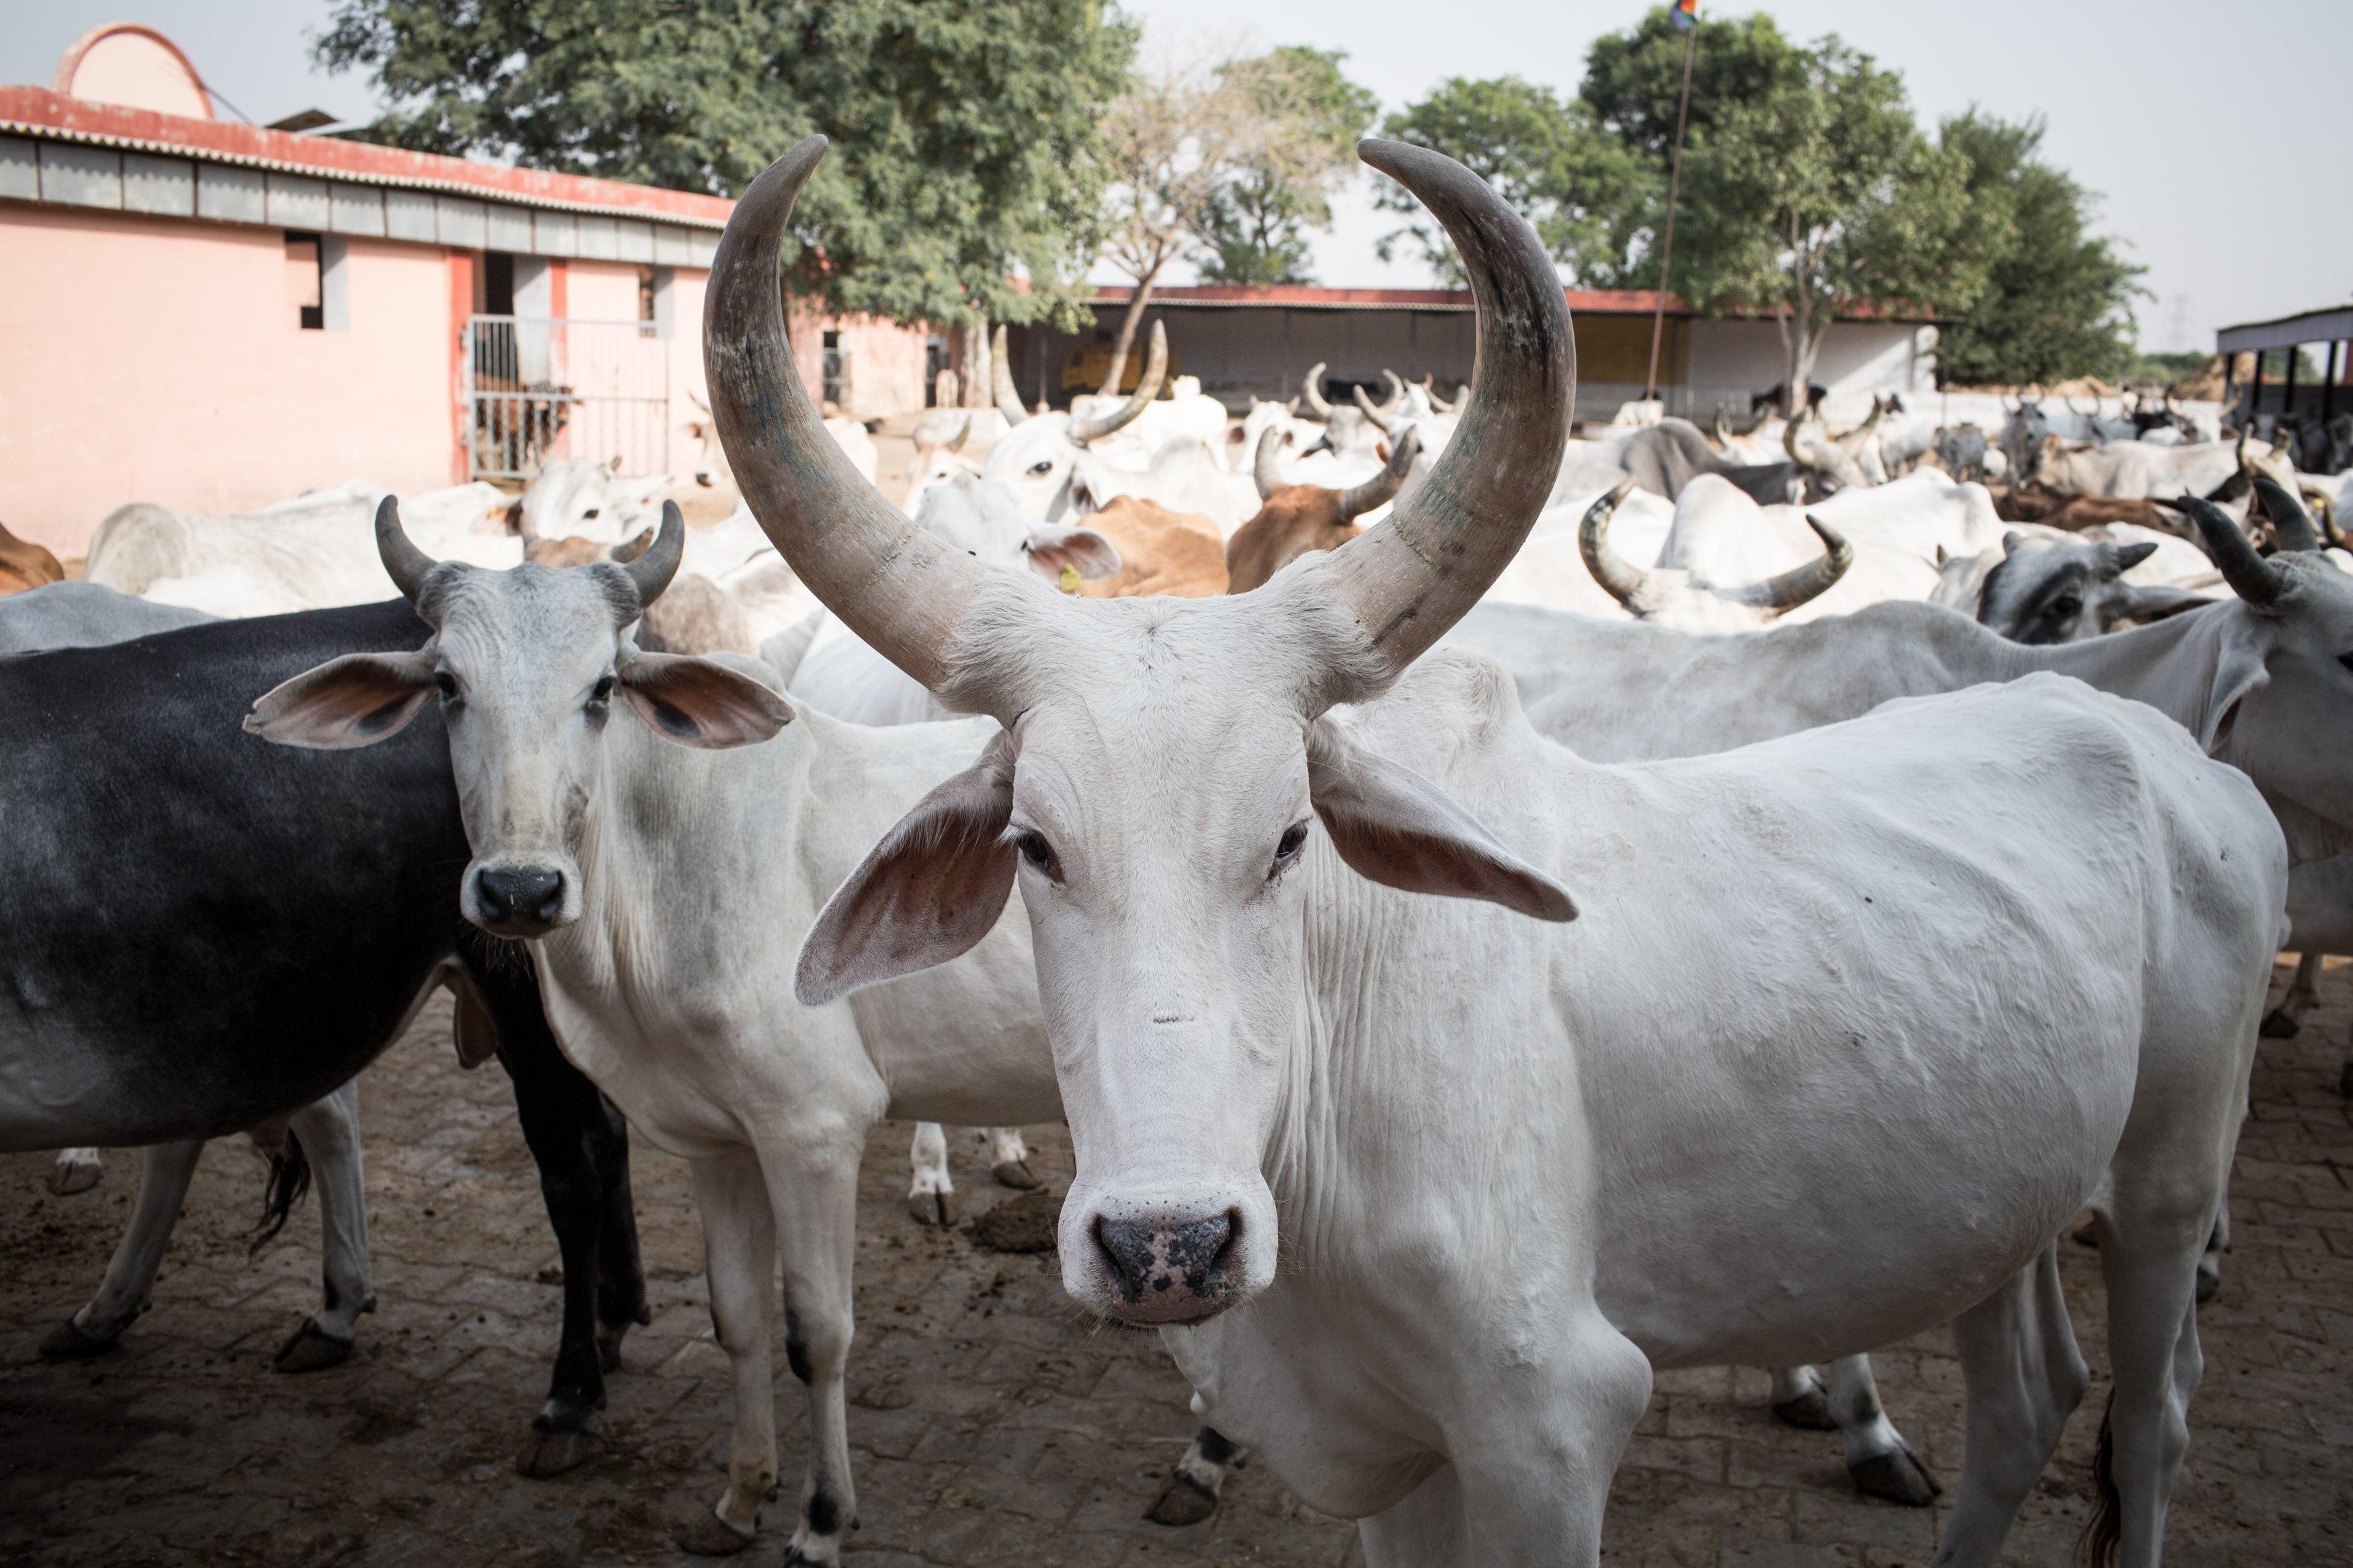 'We will hang those who kill cows'